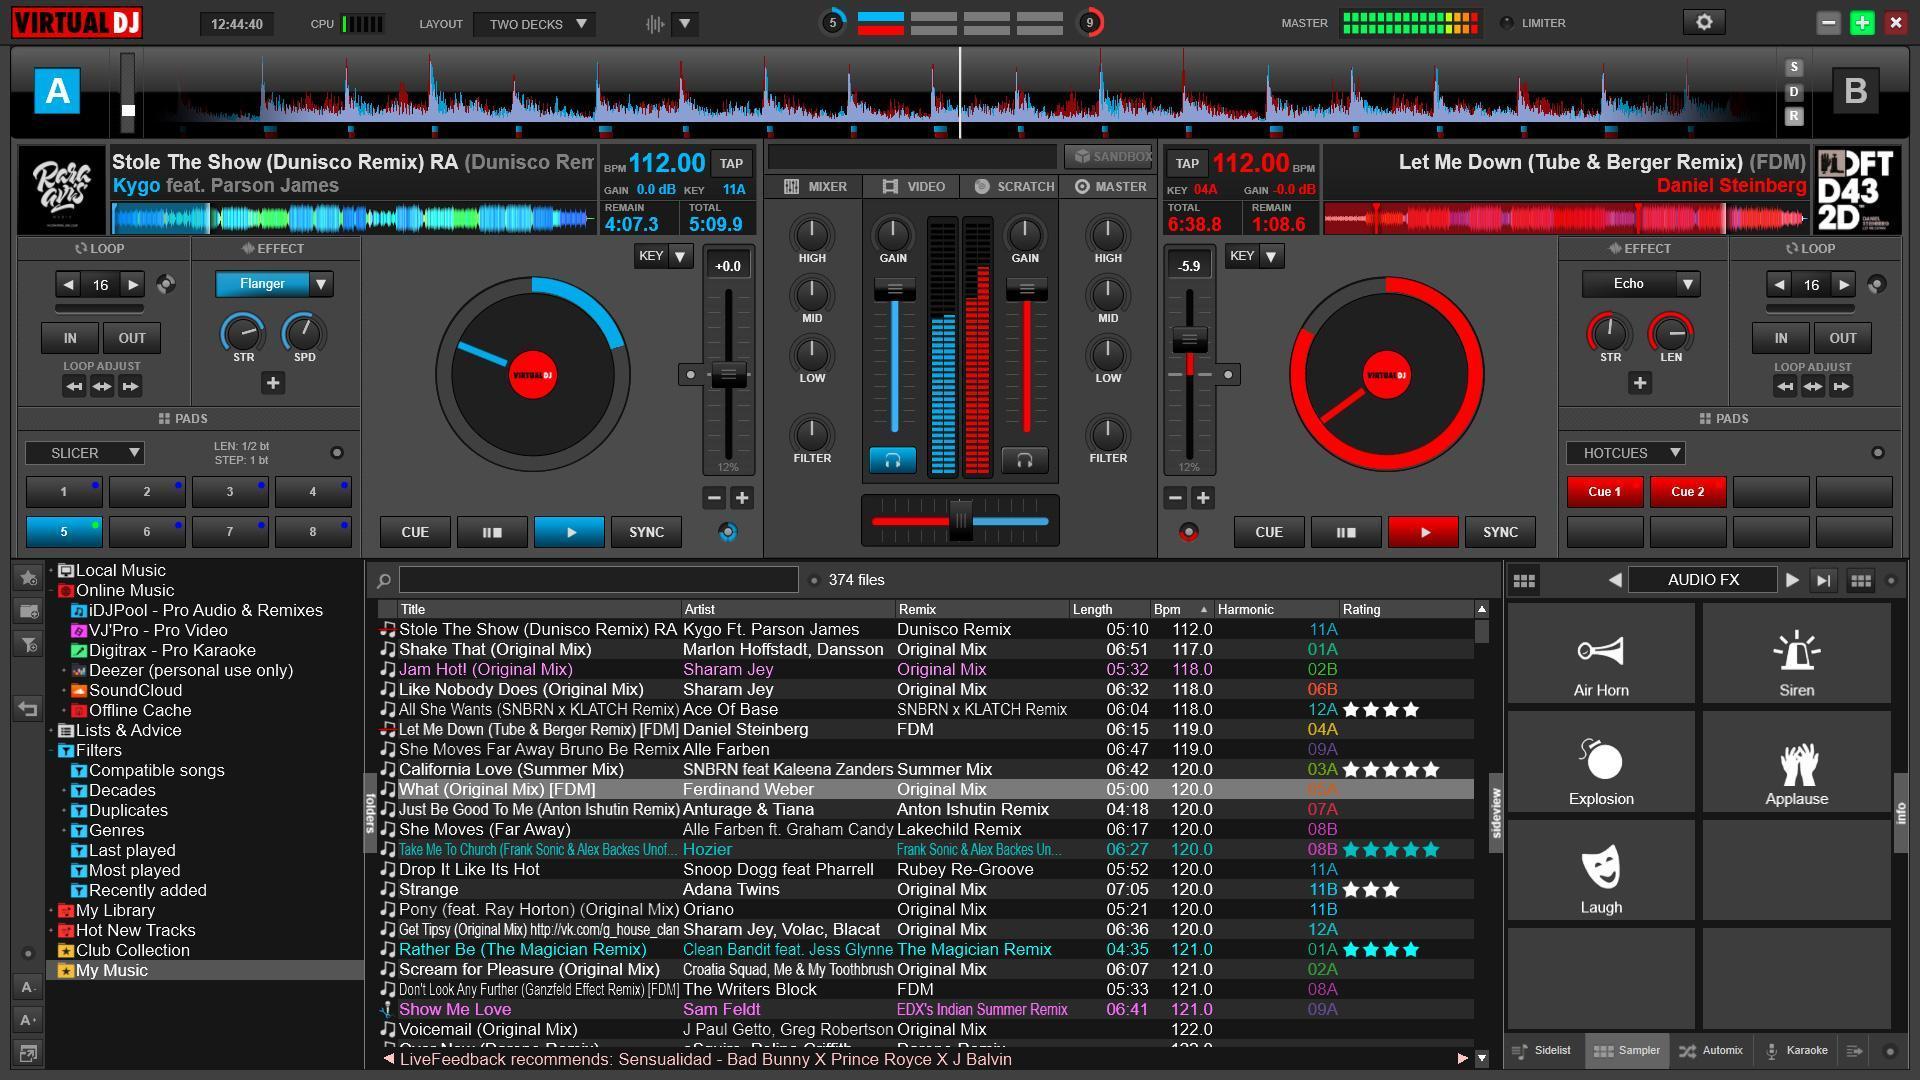 virtual dj 7 free download for pc